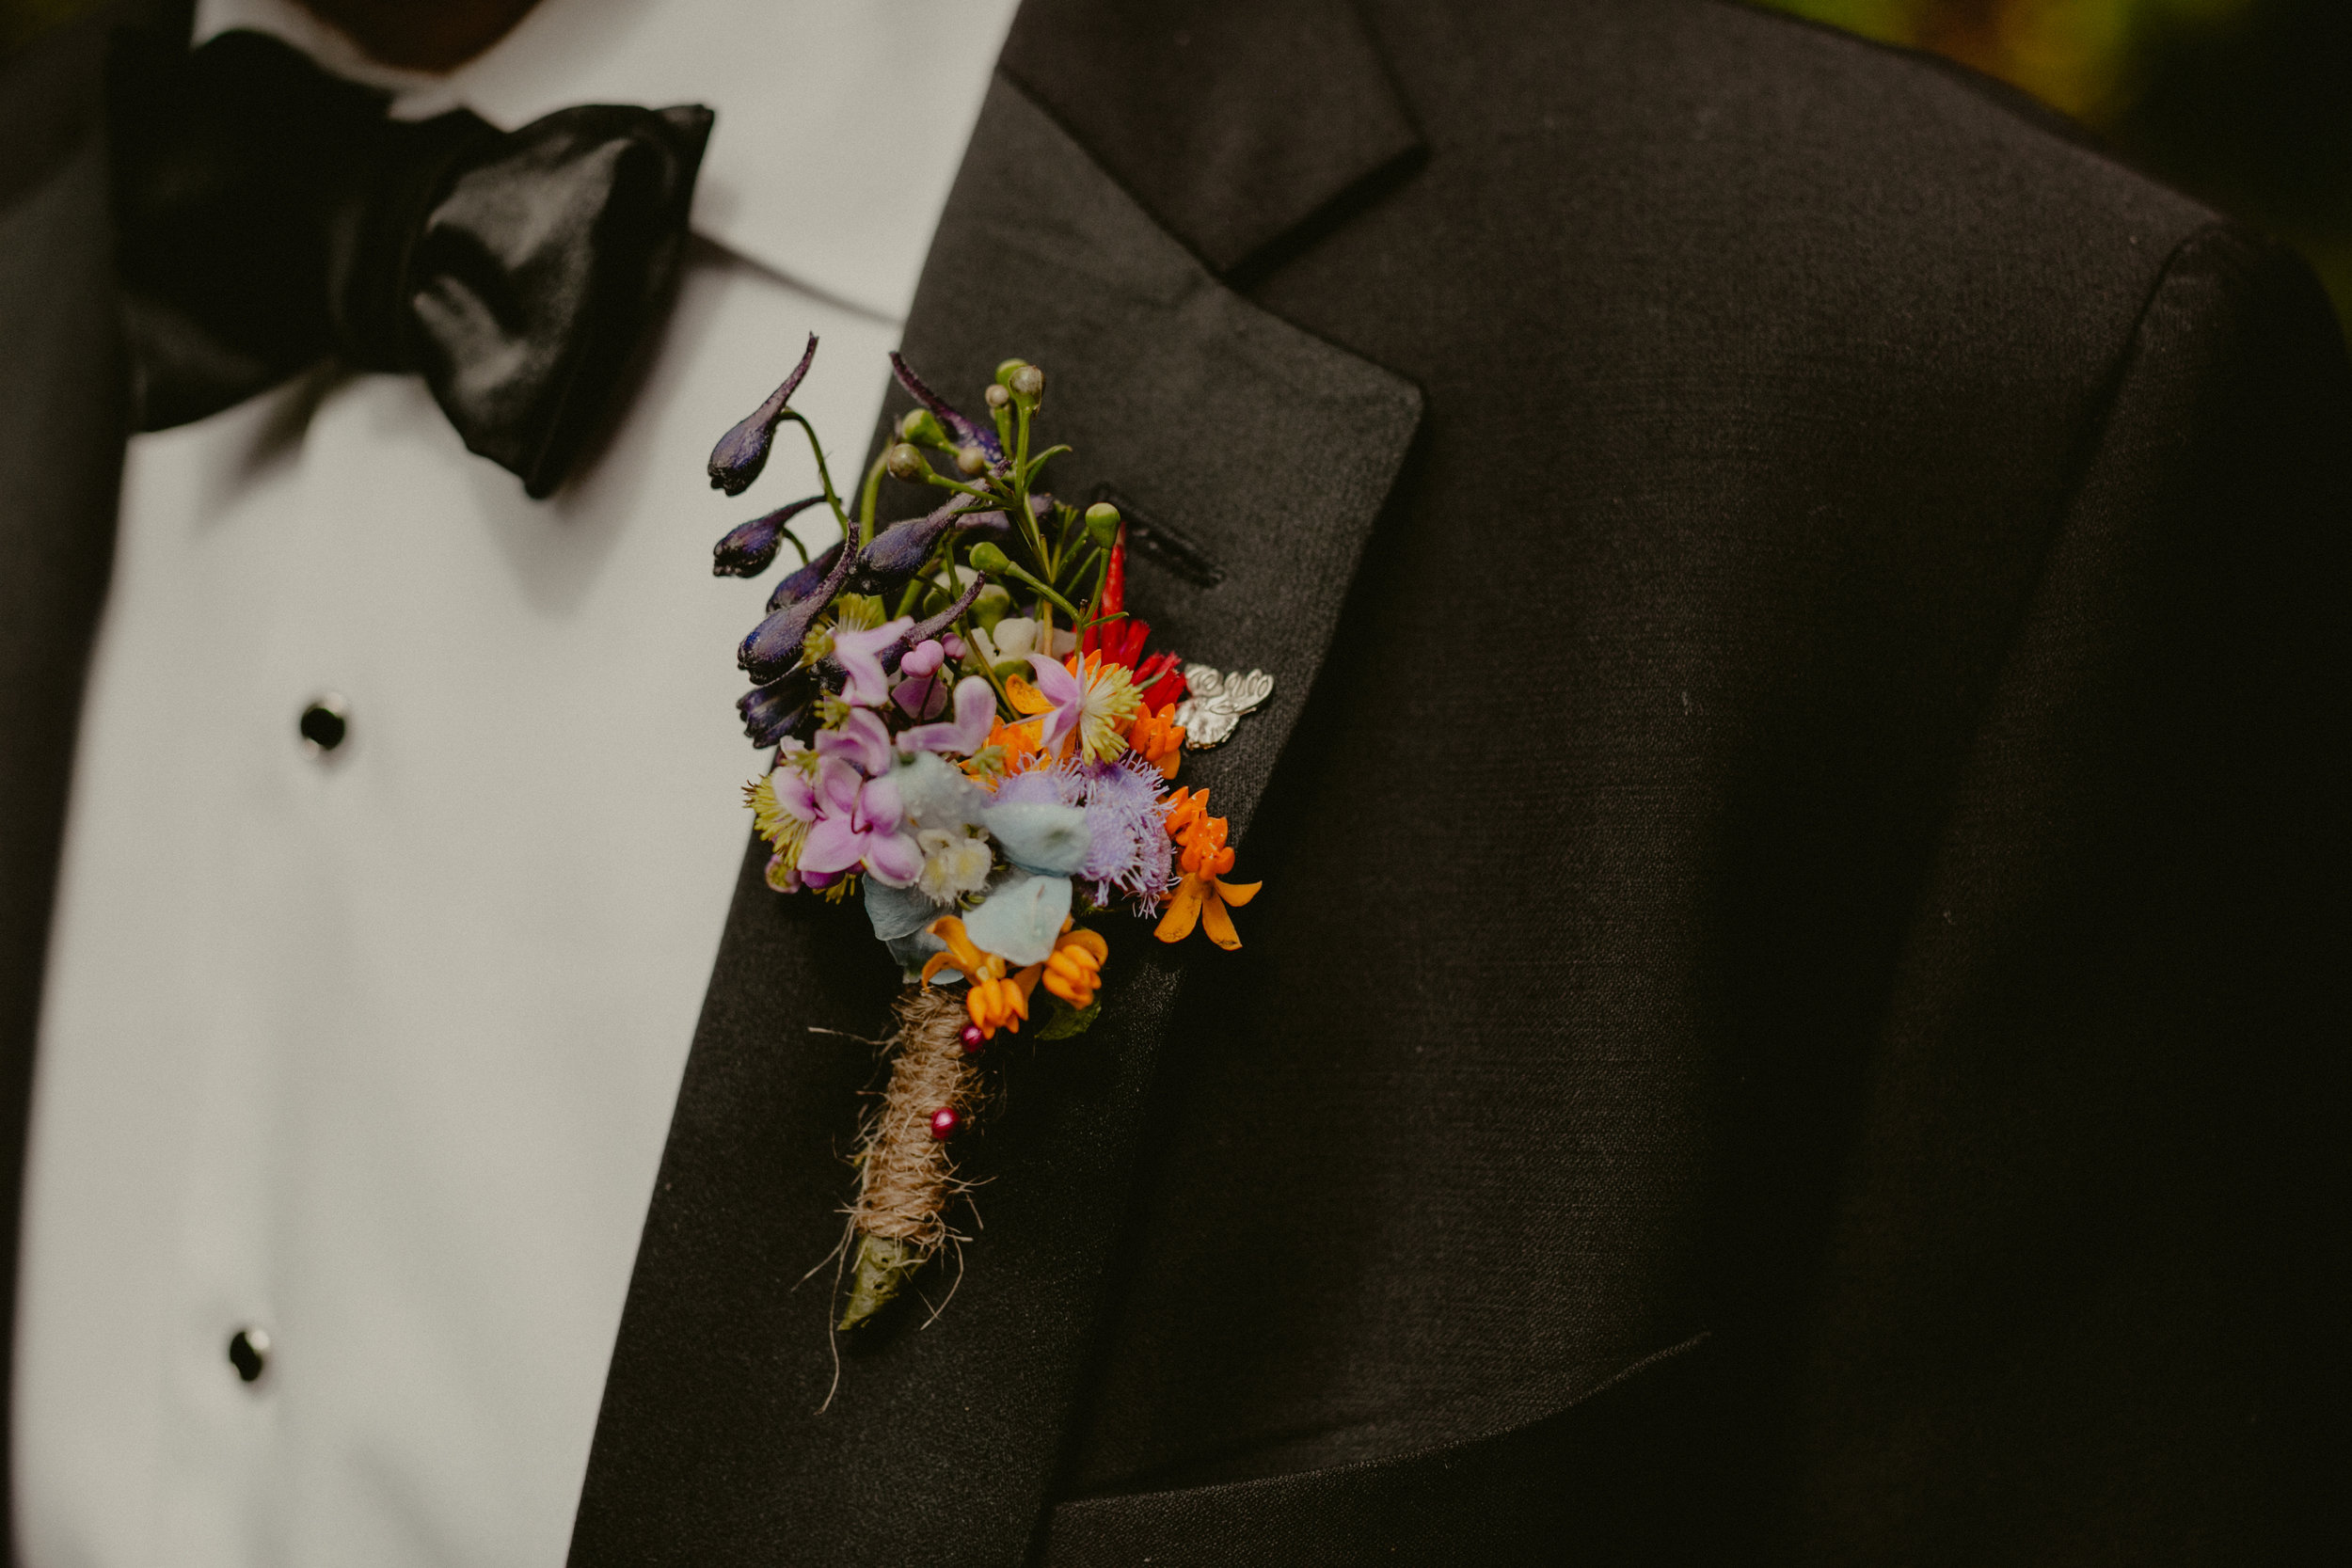 DEER_MOUNTAIN_INN_WEDDING_CHELLISE_MICHAEL_PHOTOGRAPHY-1103.jpg